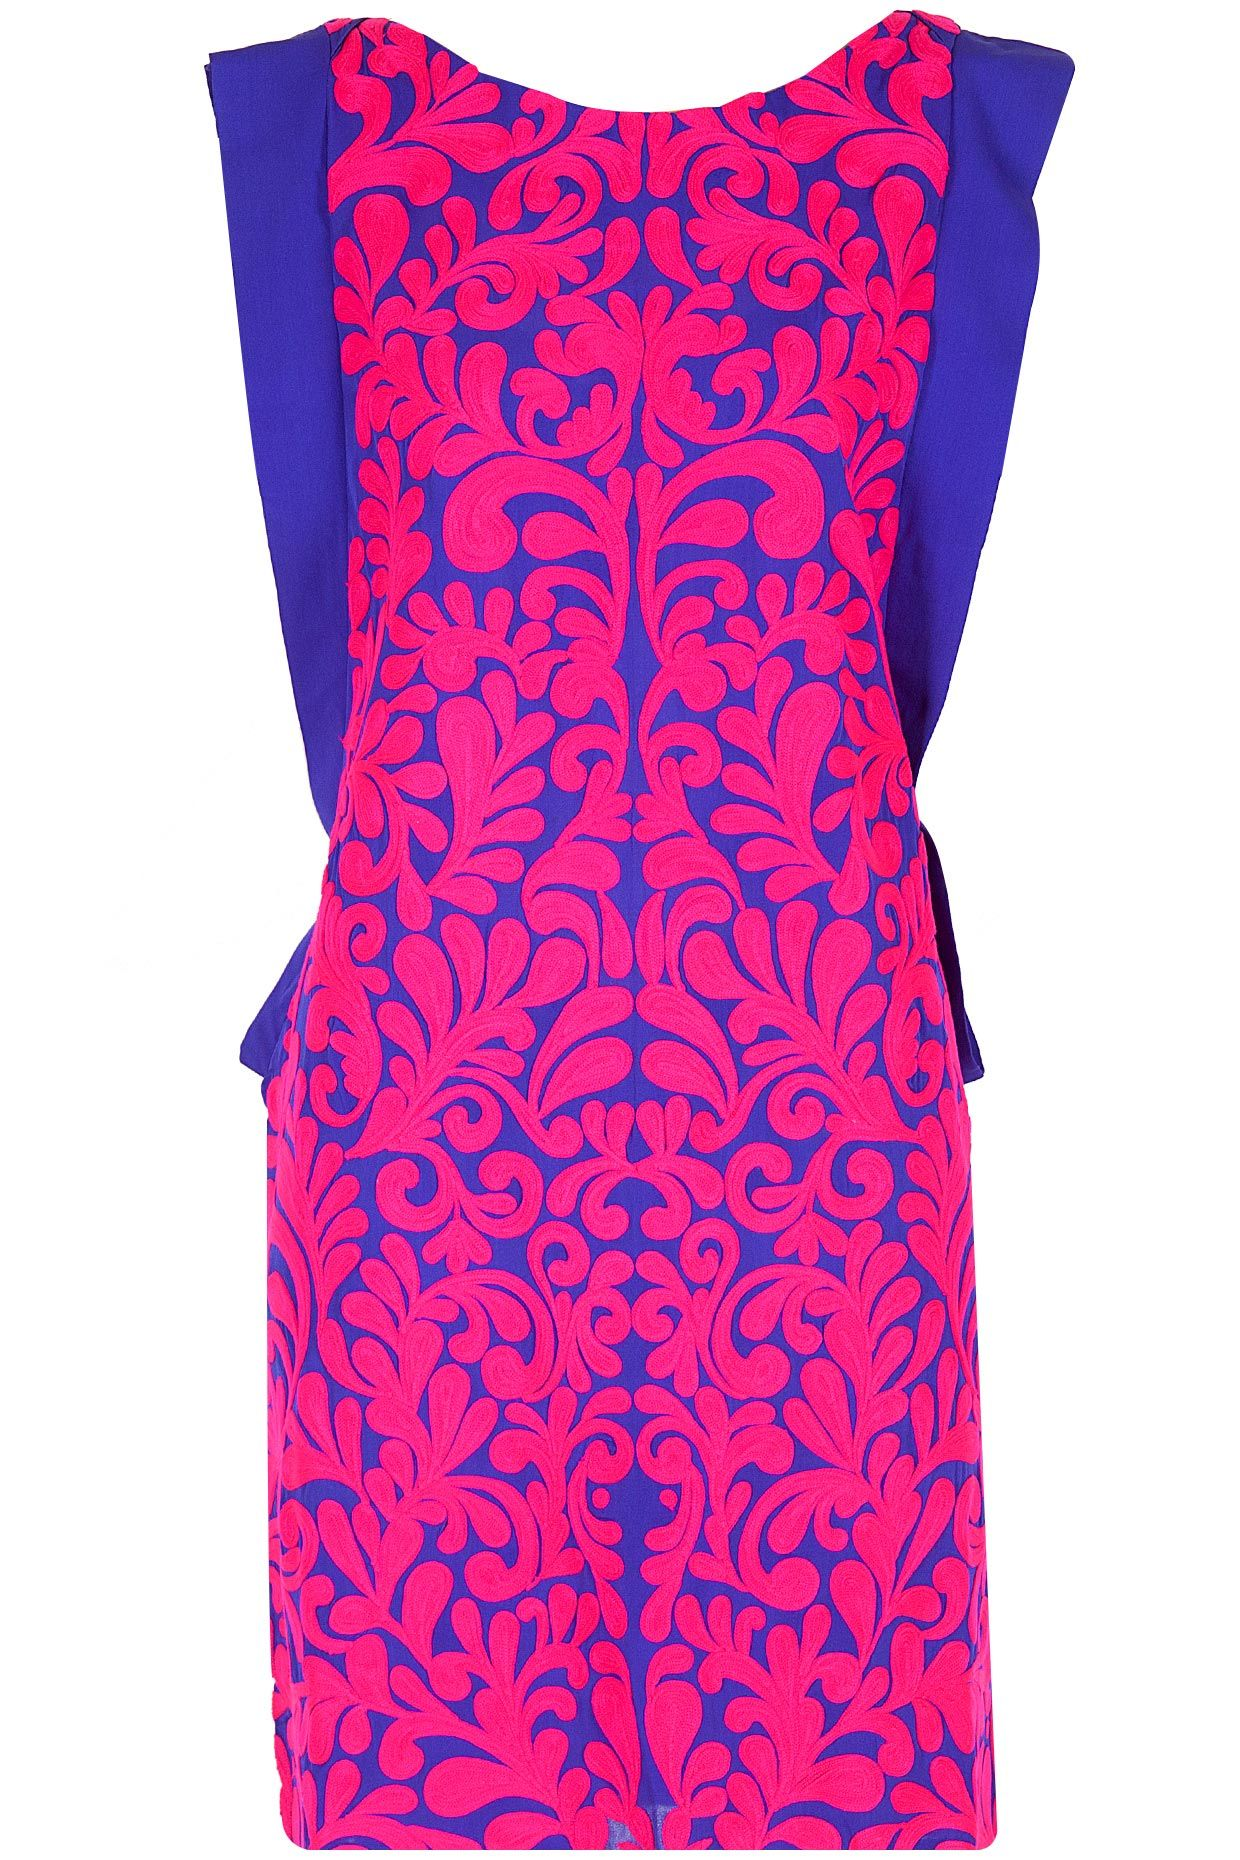 Blue and fushia embroidered dress | fashion. | Pinterest | Mexico ...